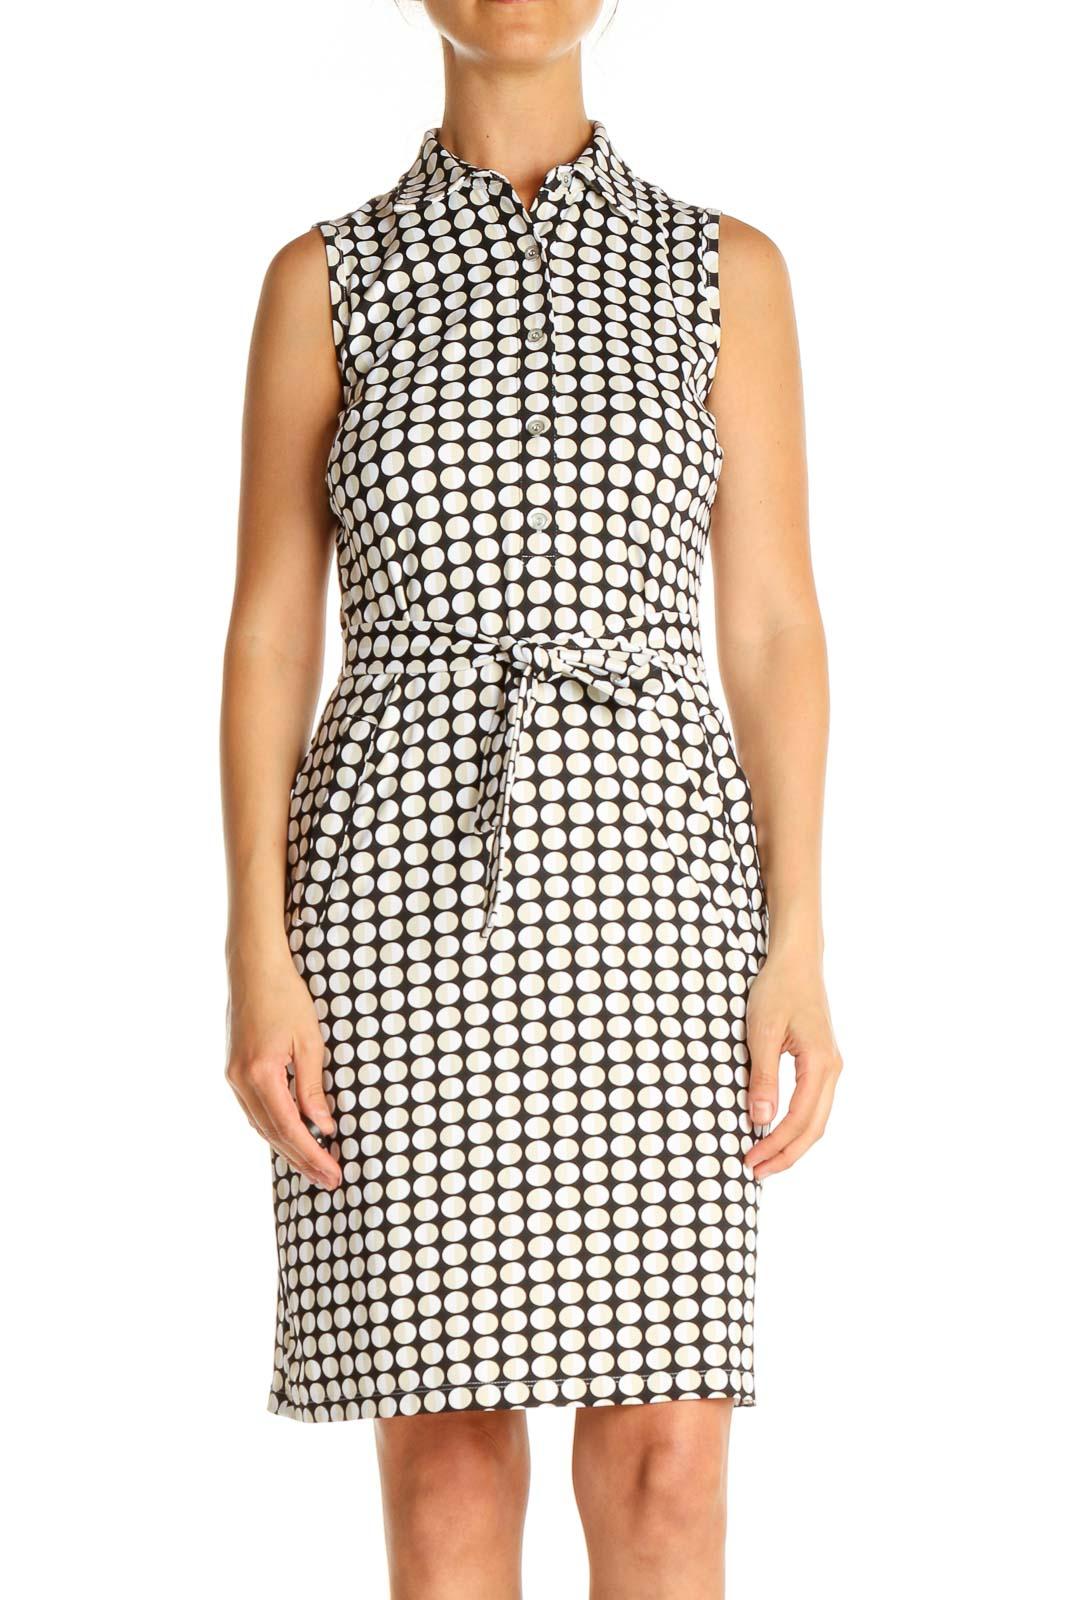 Black Geometric Print Classic Sheath Dress Front